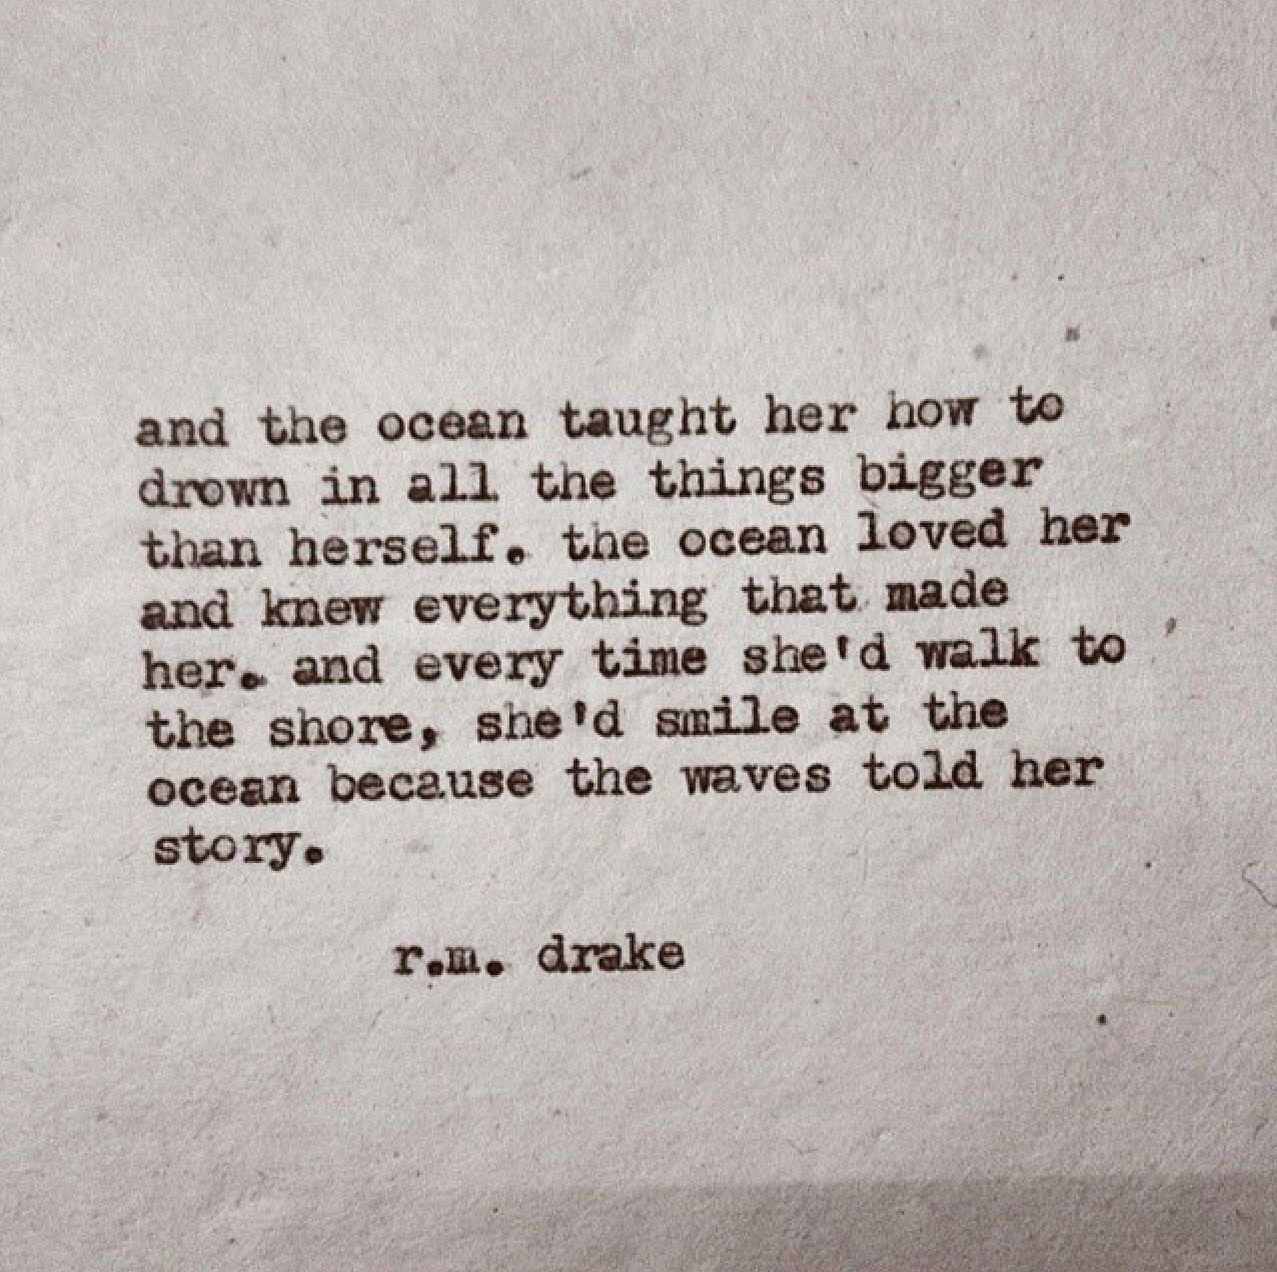 the ocean loved her